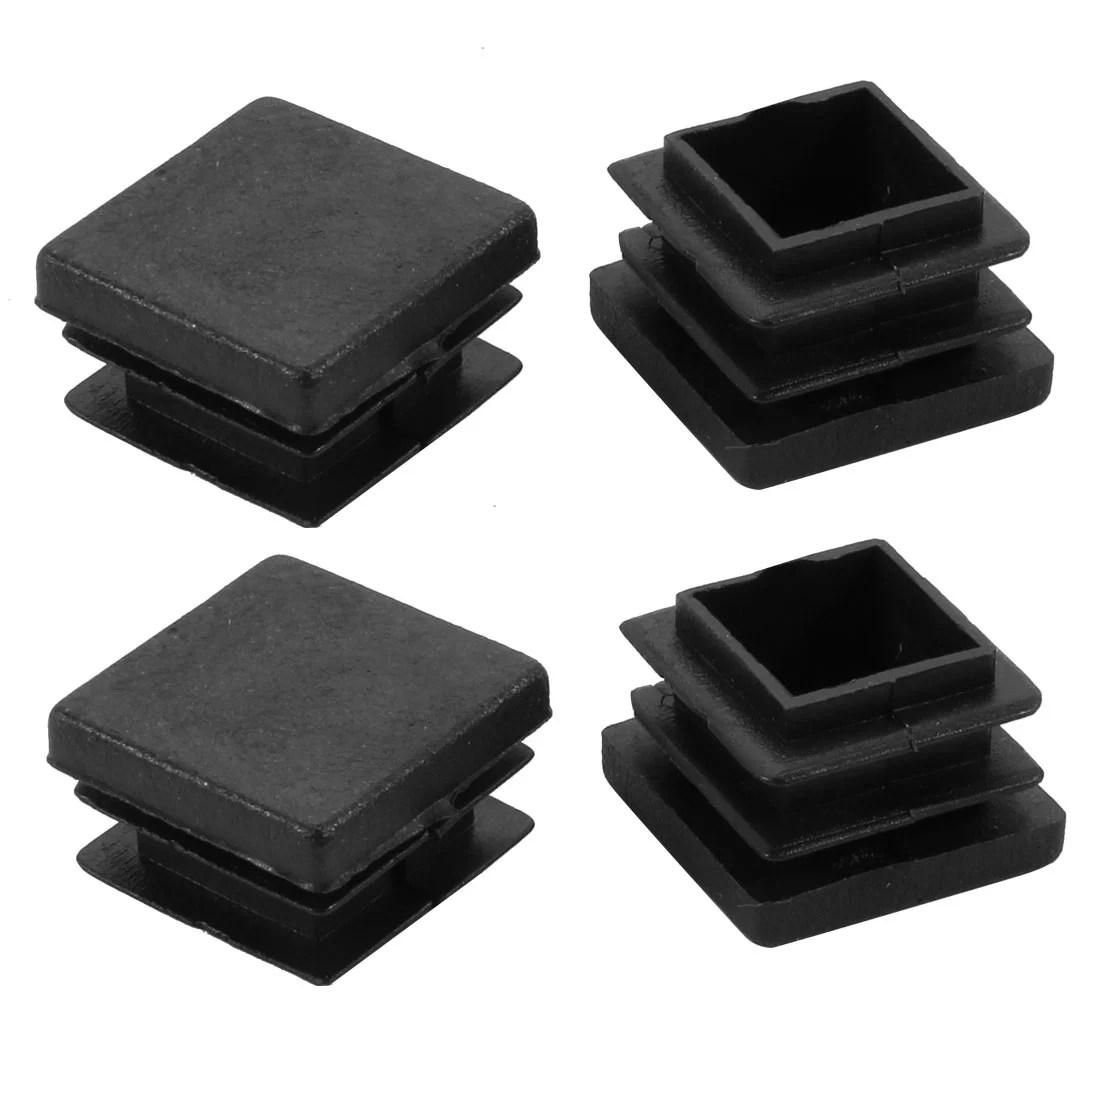 folding chair leg floor protectors height toilets 4pcs 22x22mm black plastic square cabinet